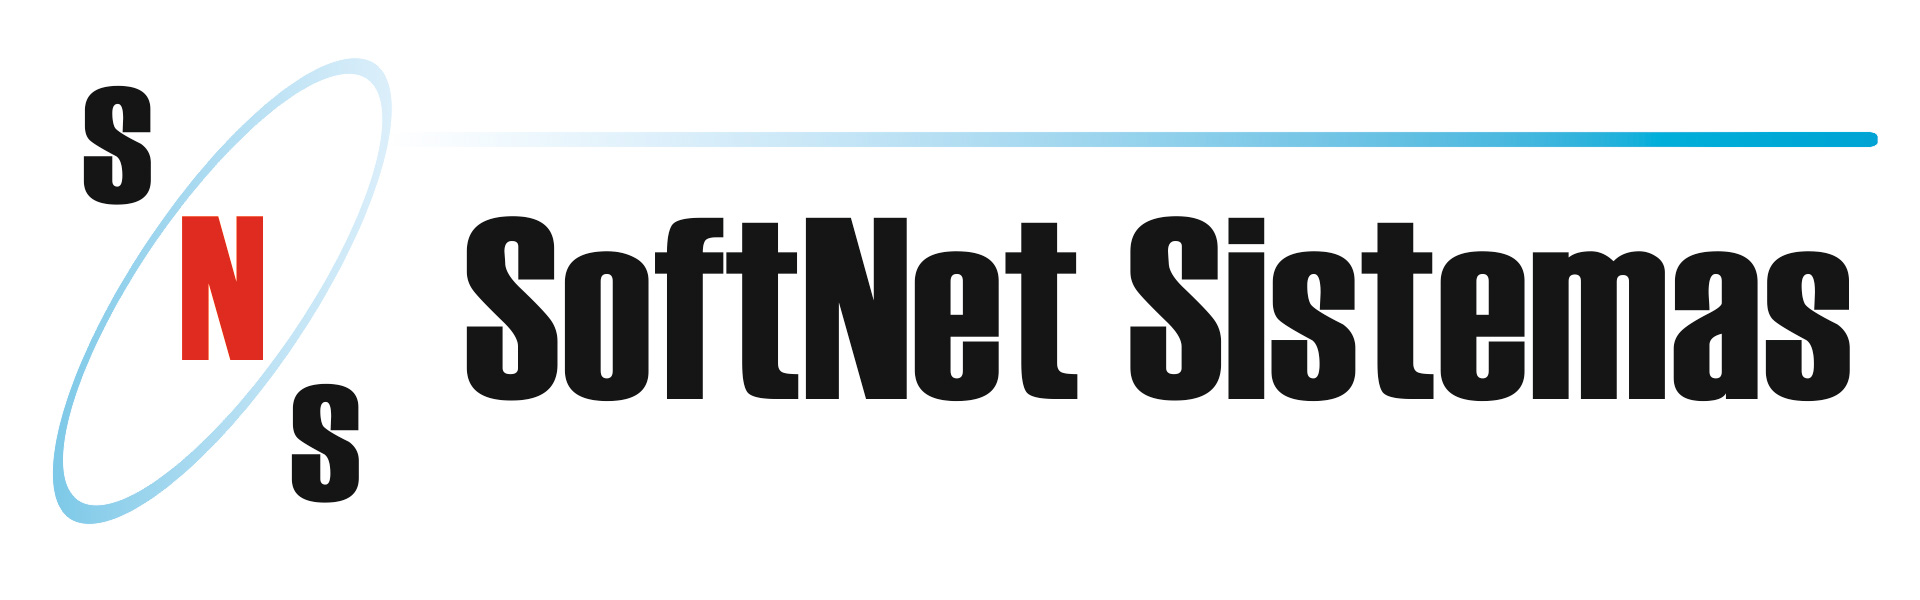 ⇨ Softnet Sistemas, S.L.